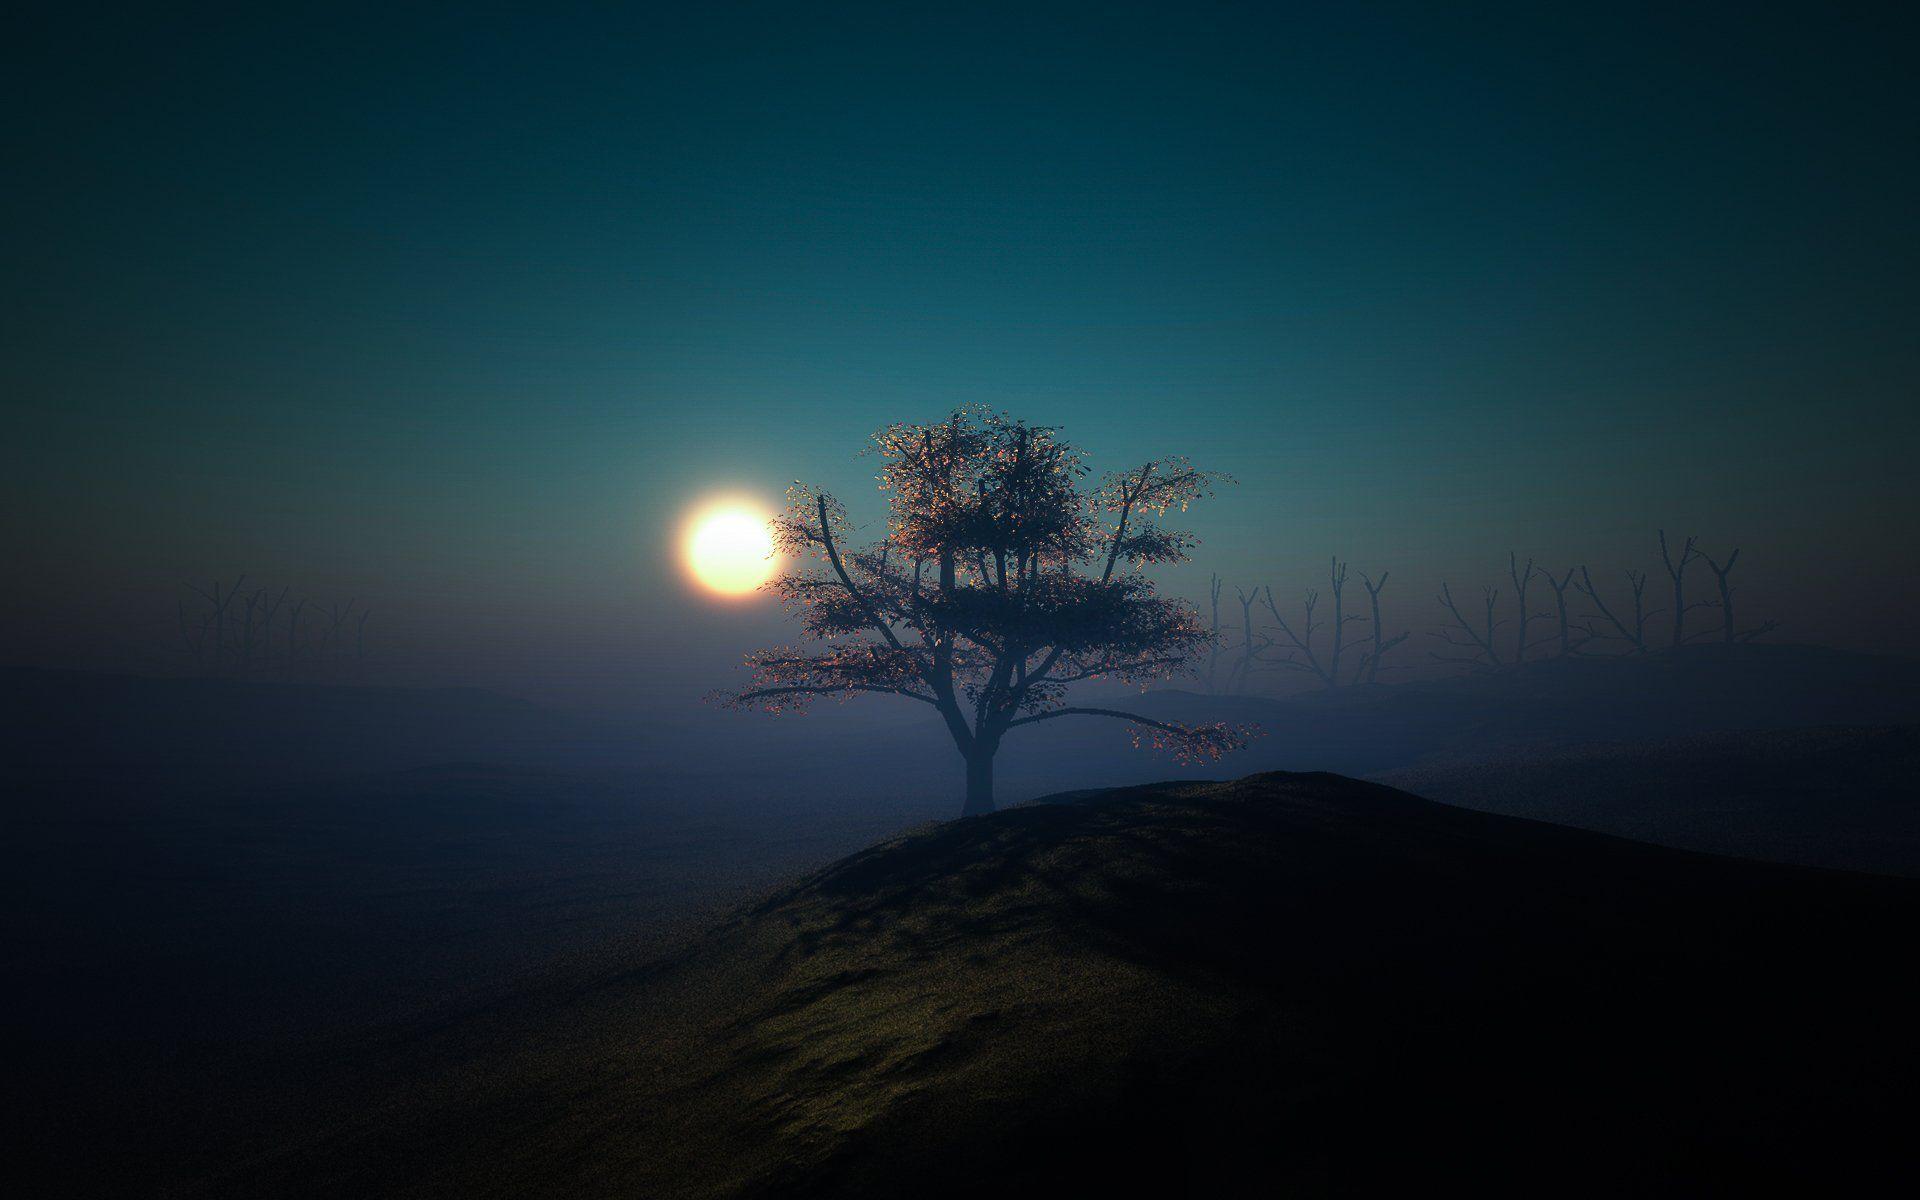 дерево холм луна свет ночь минимализм HD обои для ноутбука ...